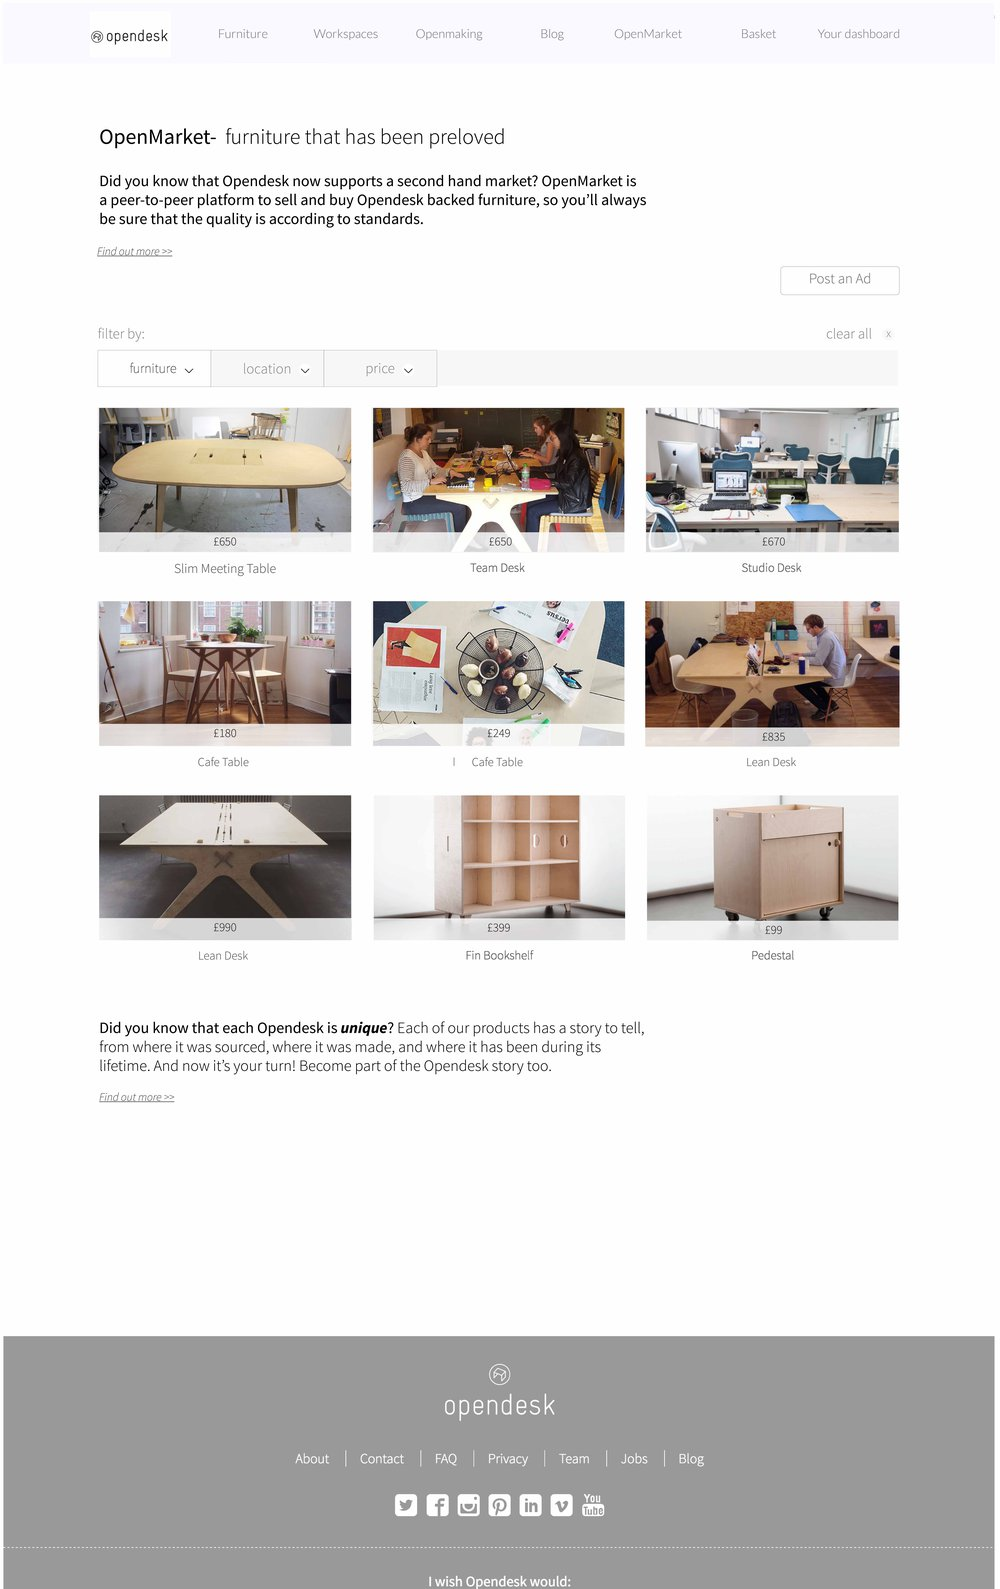 OpenMarket / second hand platform